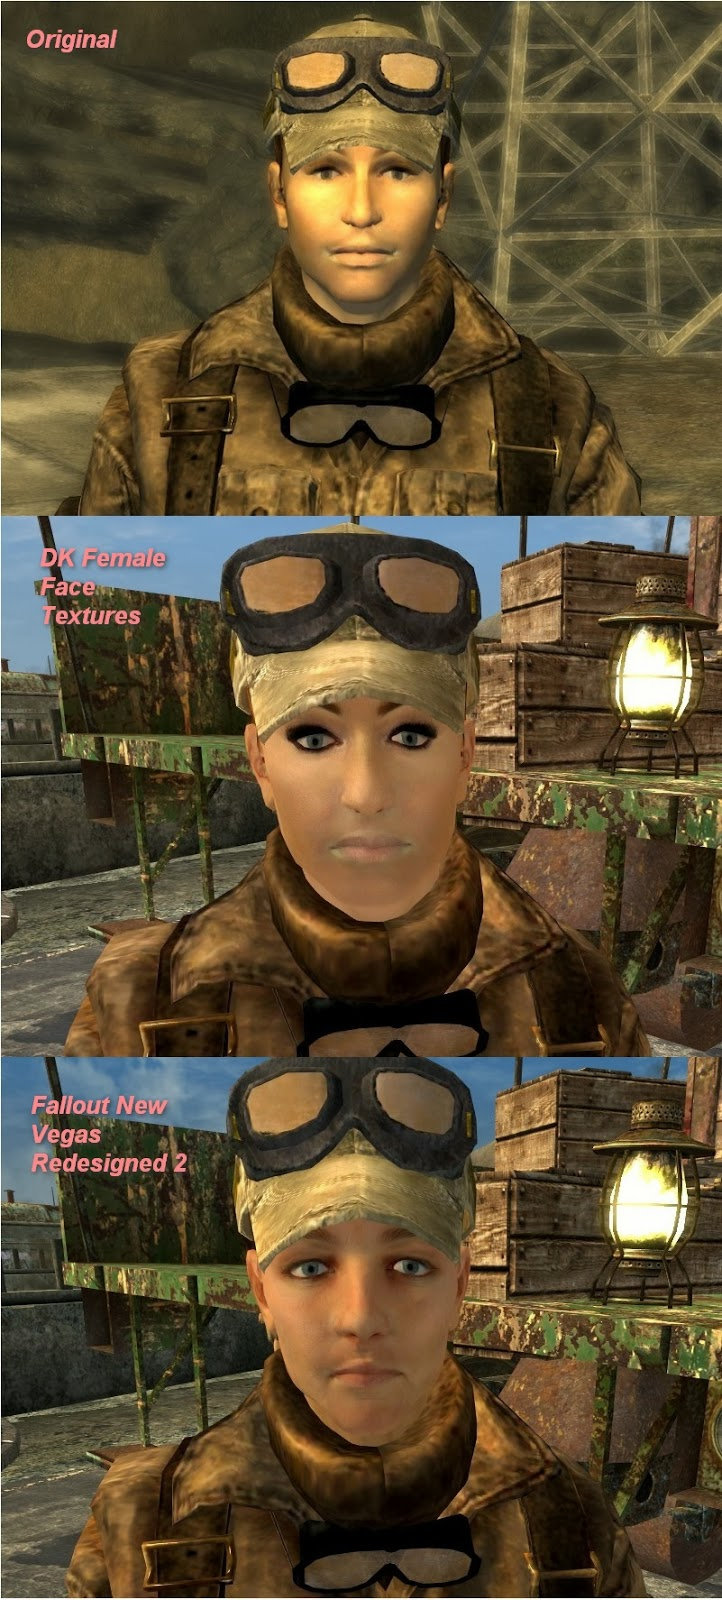 Fallout new vegas prostitute girl xxx image